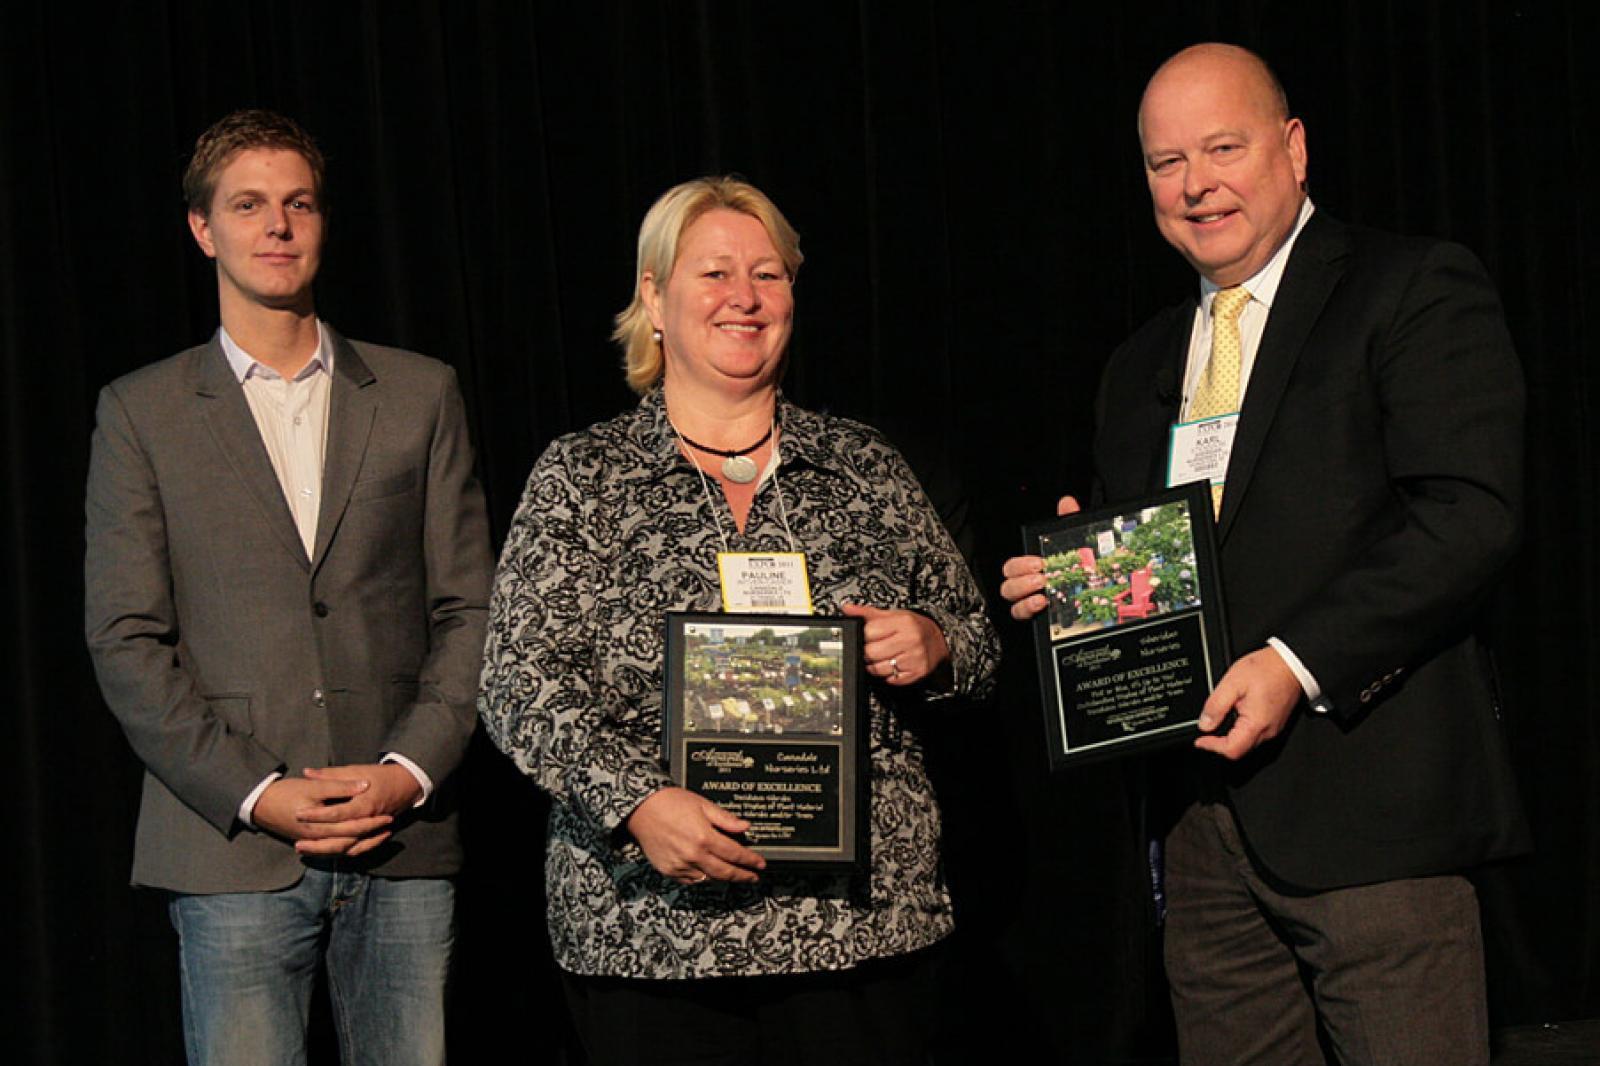 Garden Centre Sector Group chairman Michael Van Dongen presents awards to Pauline Intven-Casier of Canadale Nurseries and Karl Stensson of Sheridan Nurseries.